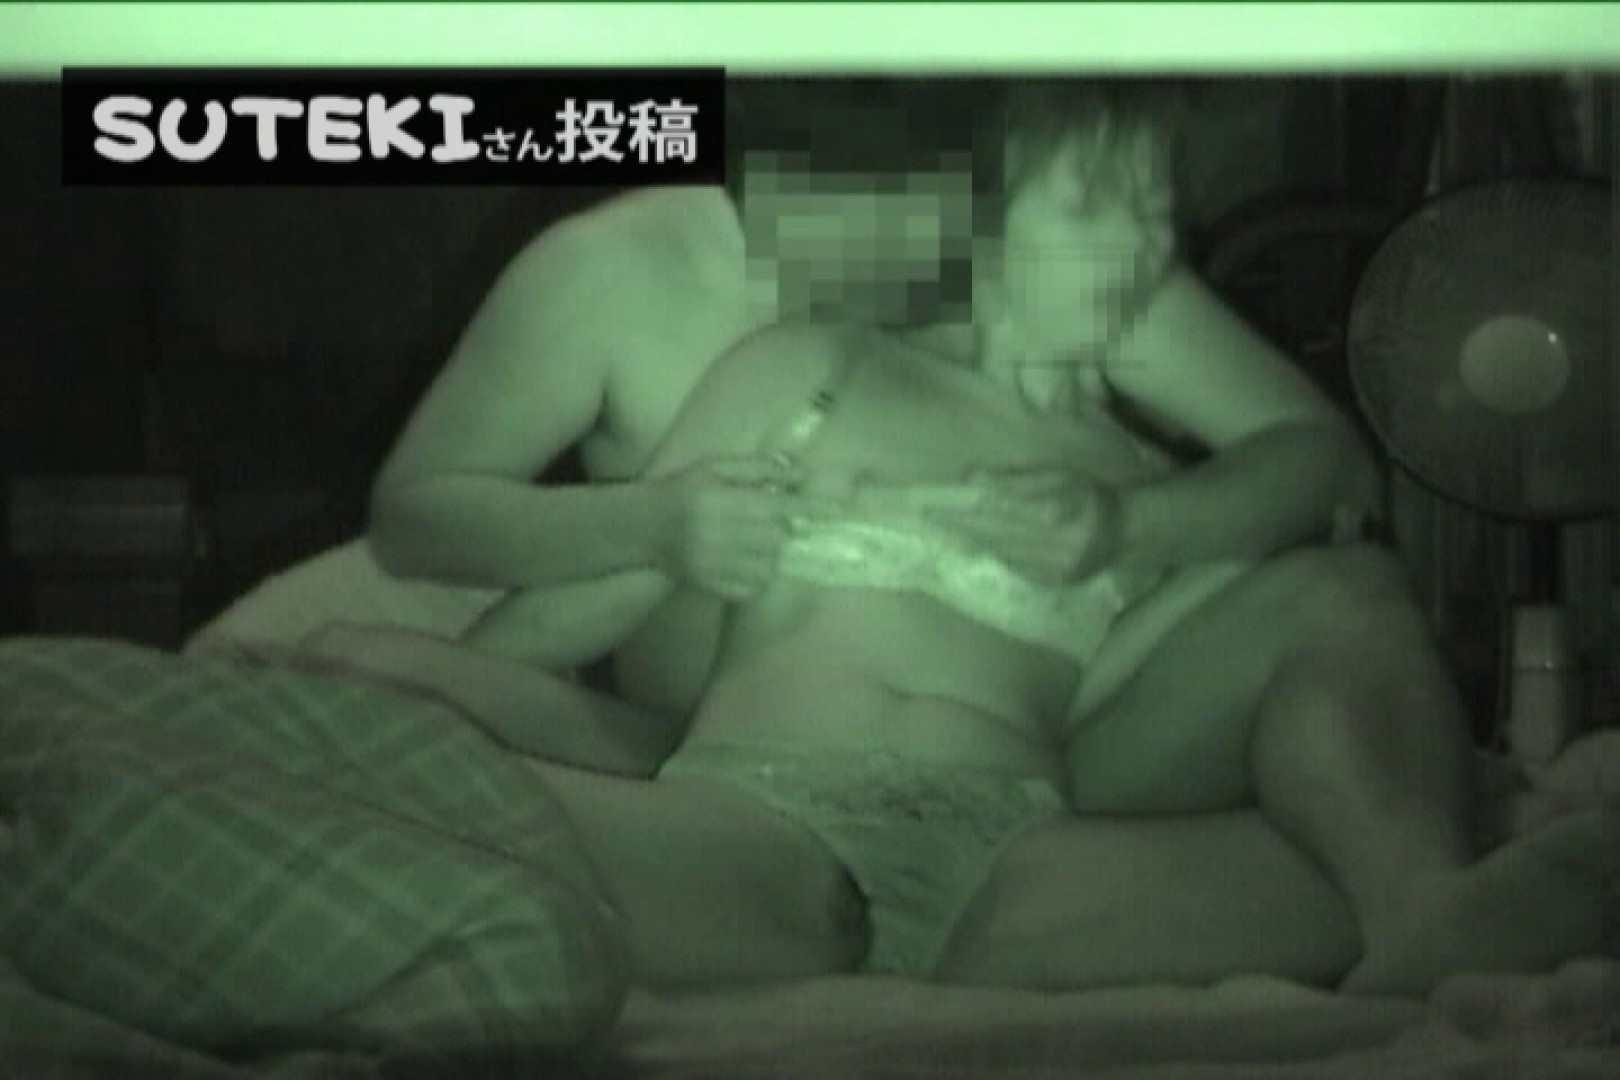 SUTEKIさん投稿 スーパーナイトショット SEX映像 隠し撮りオマンコ動画紹介 97pic 7